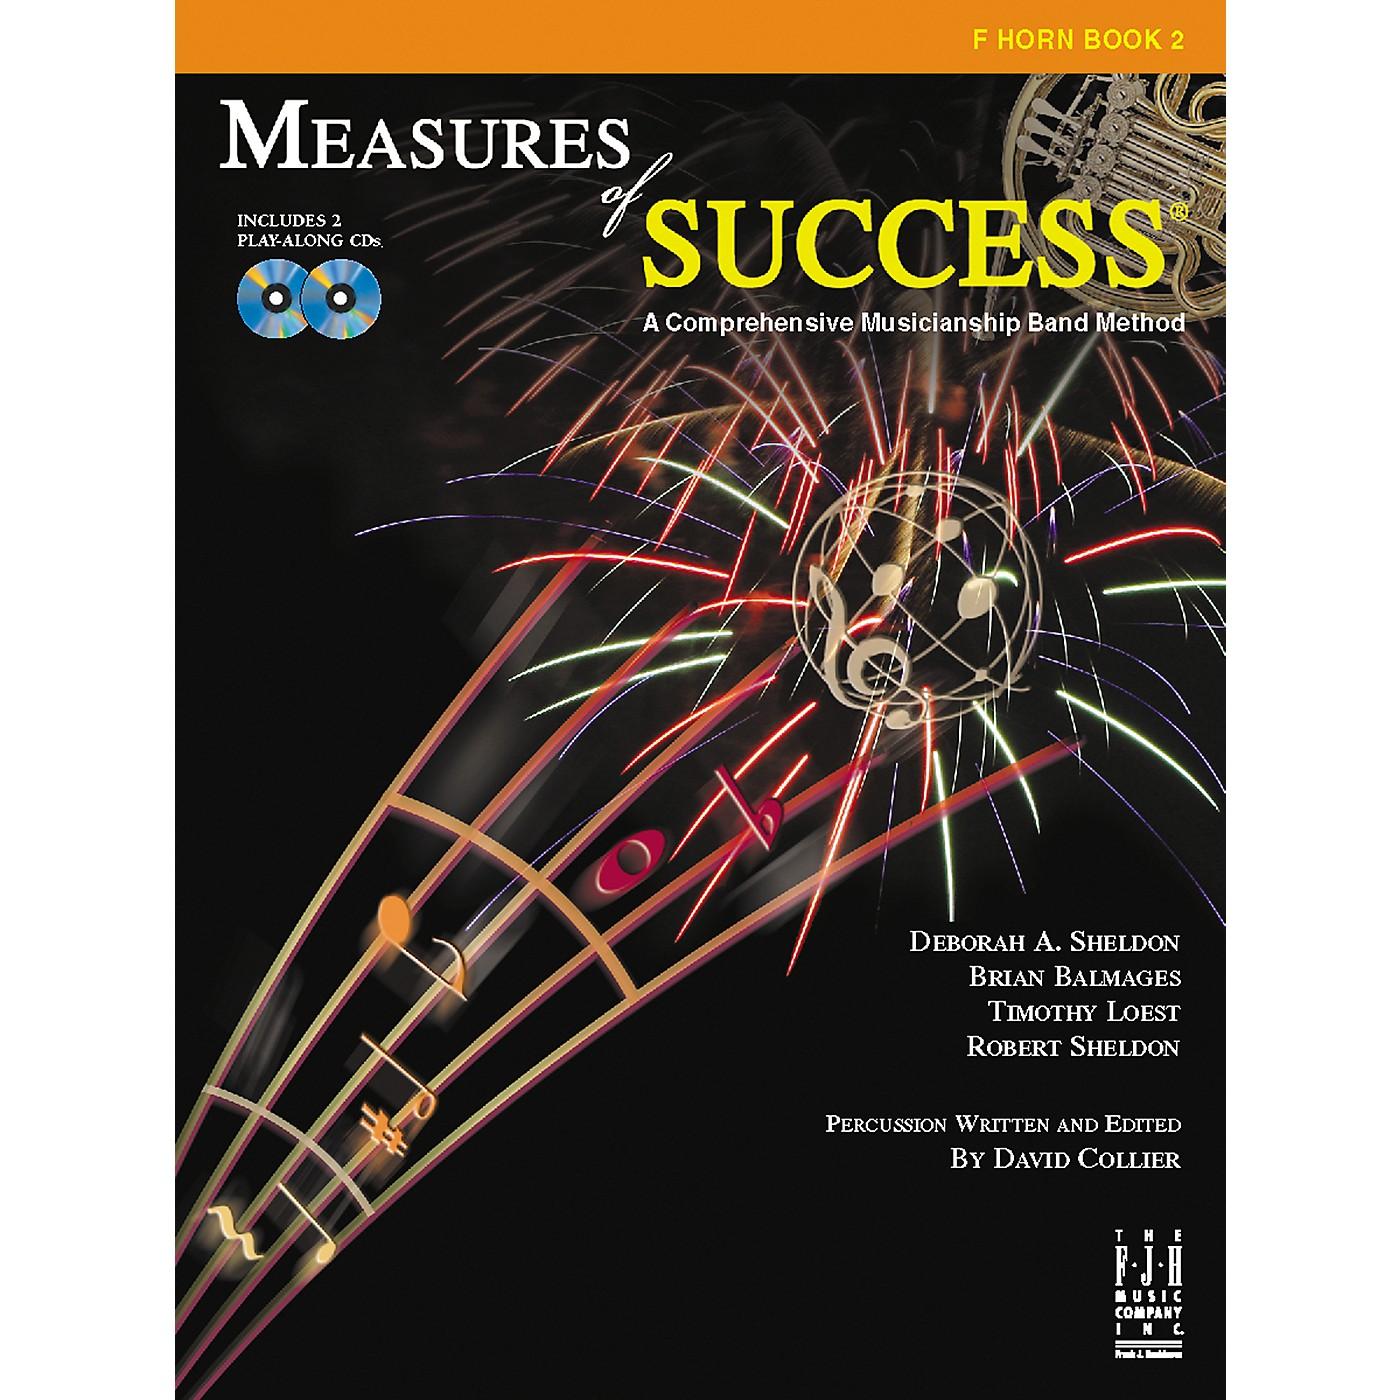 FJH Music Measures of Success F Horn Book 2 thumbnail